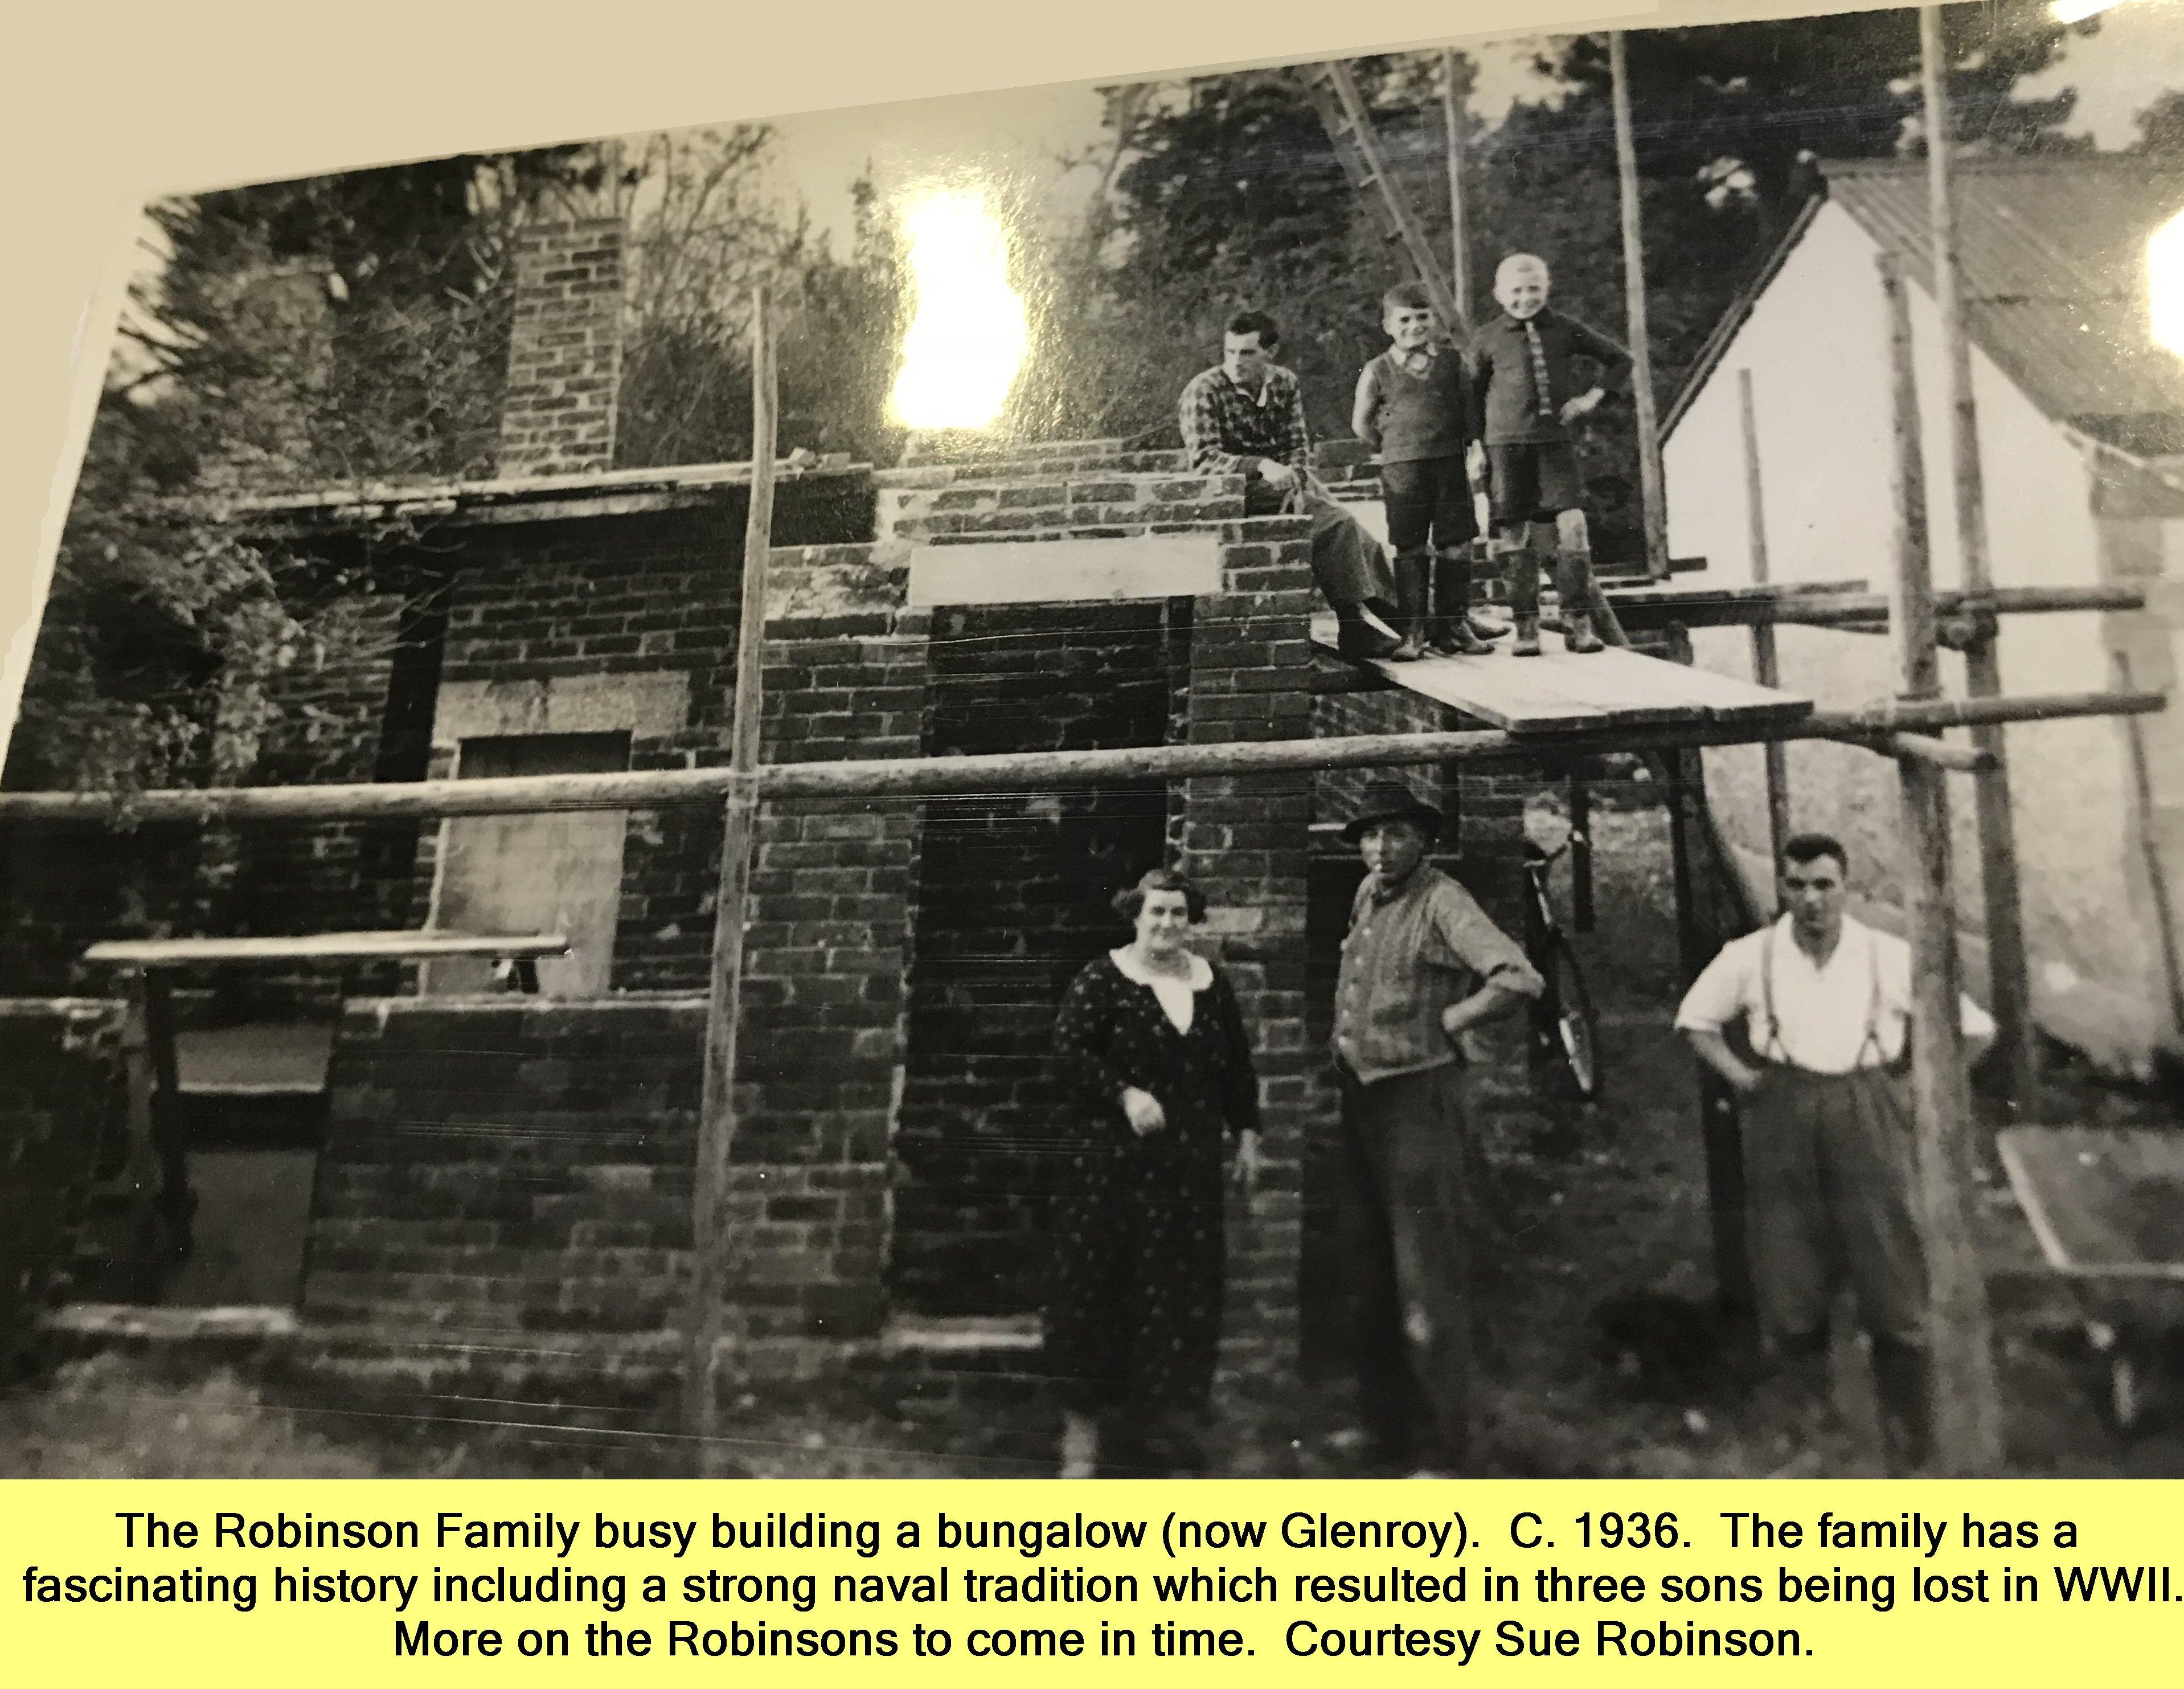 WESTBOURNE HISTORY PHOTO, ROBINSON, GLENROY, WWII